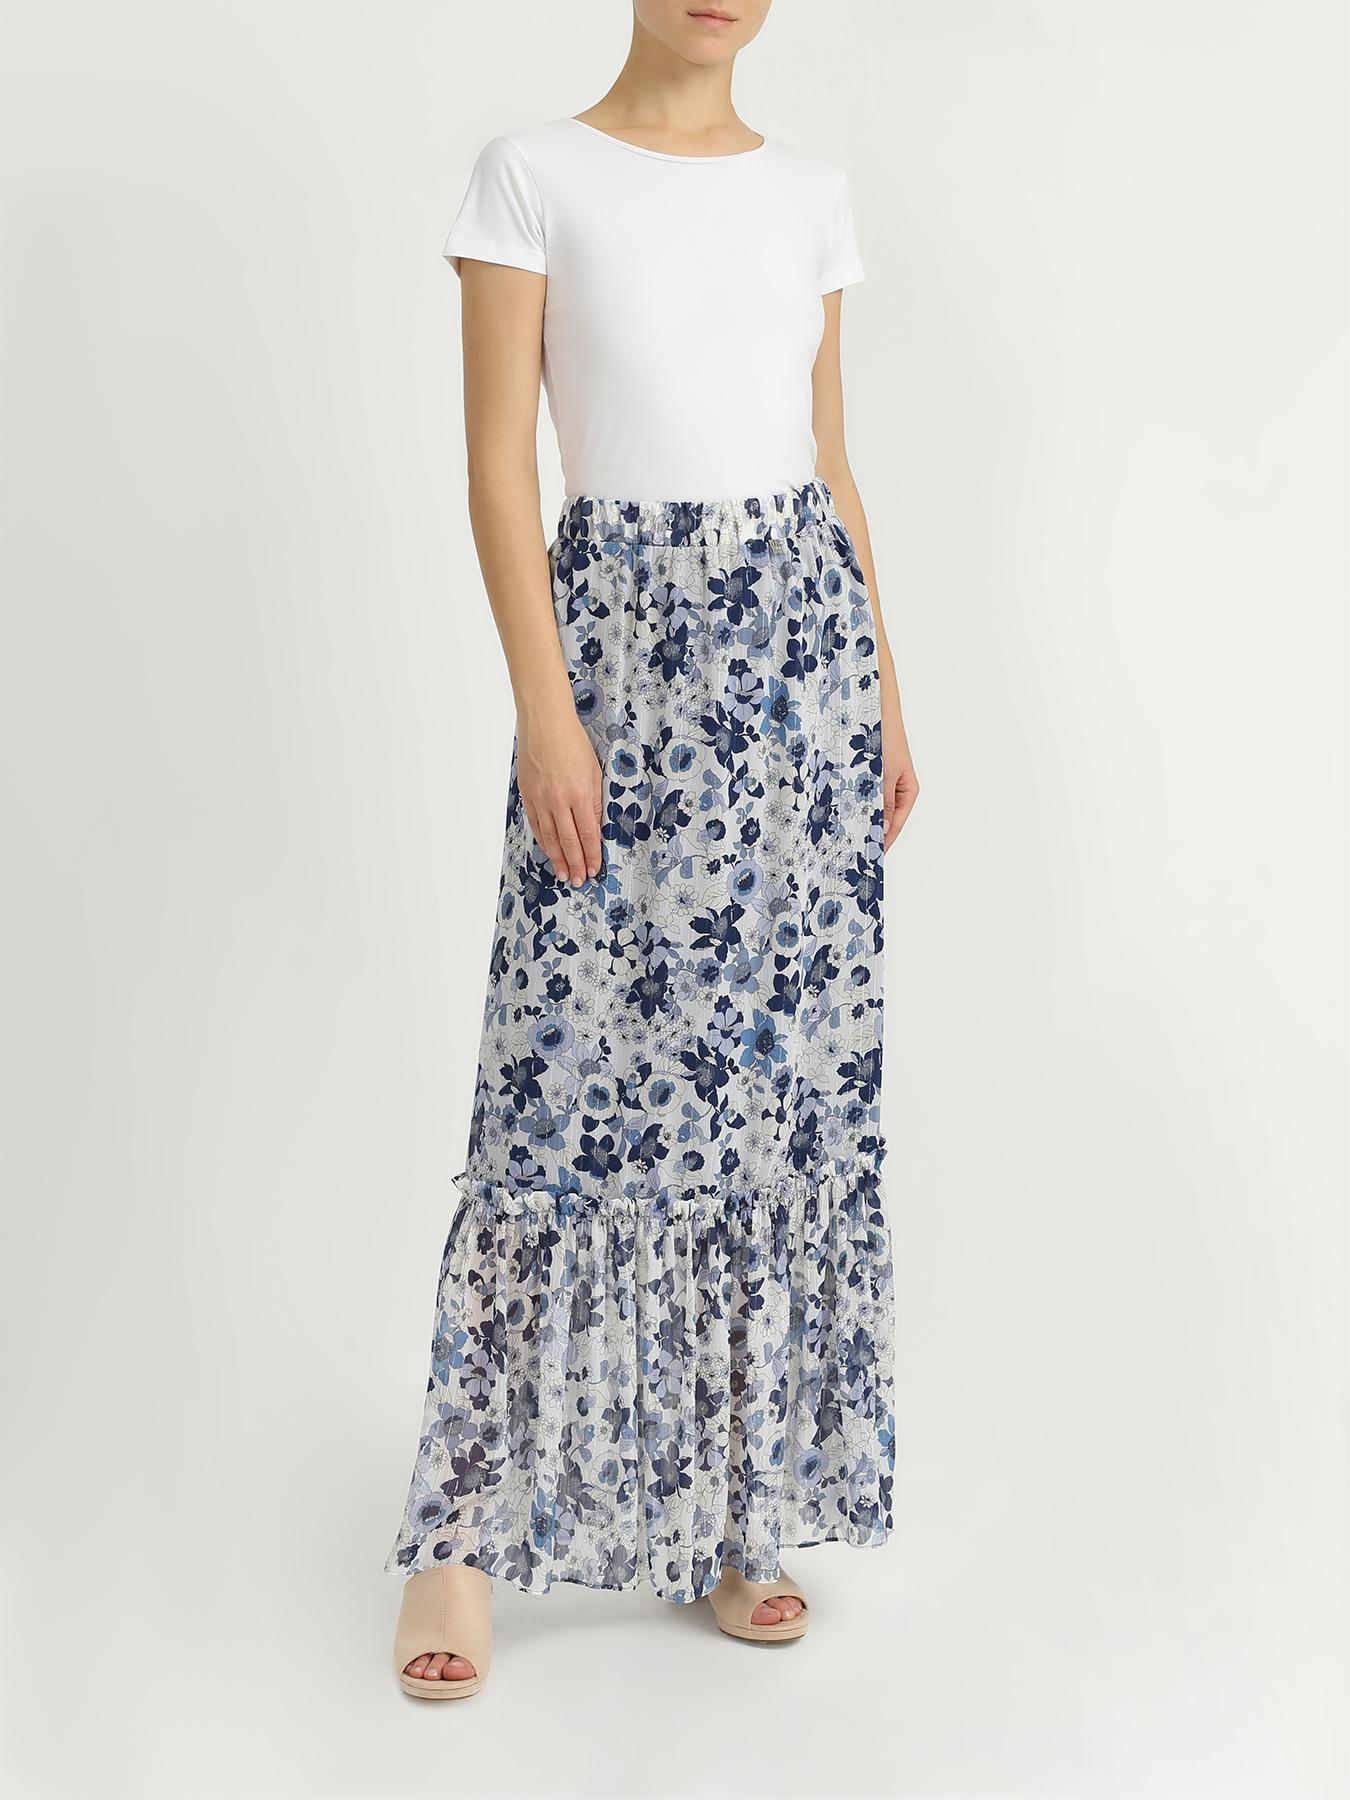 Юбка My Twin Twinset Длинная юбка с цветочными узорами twin set lingerie длинная юбка